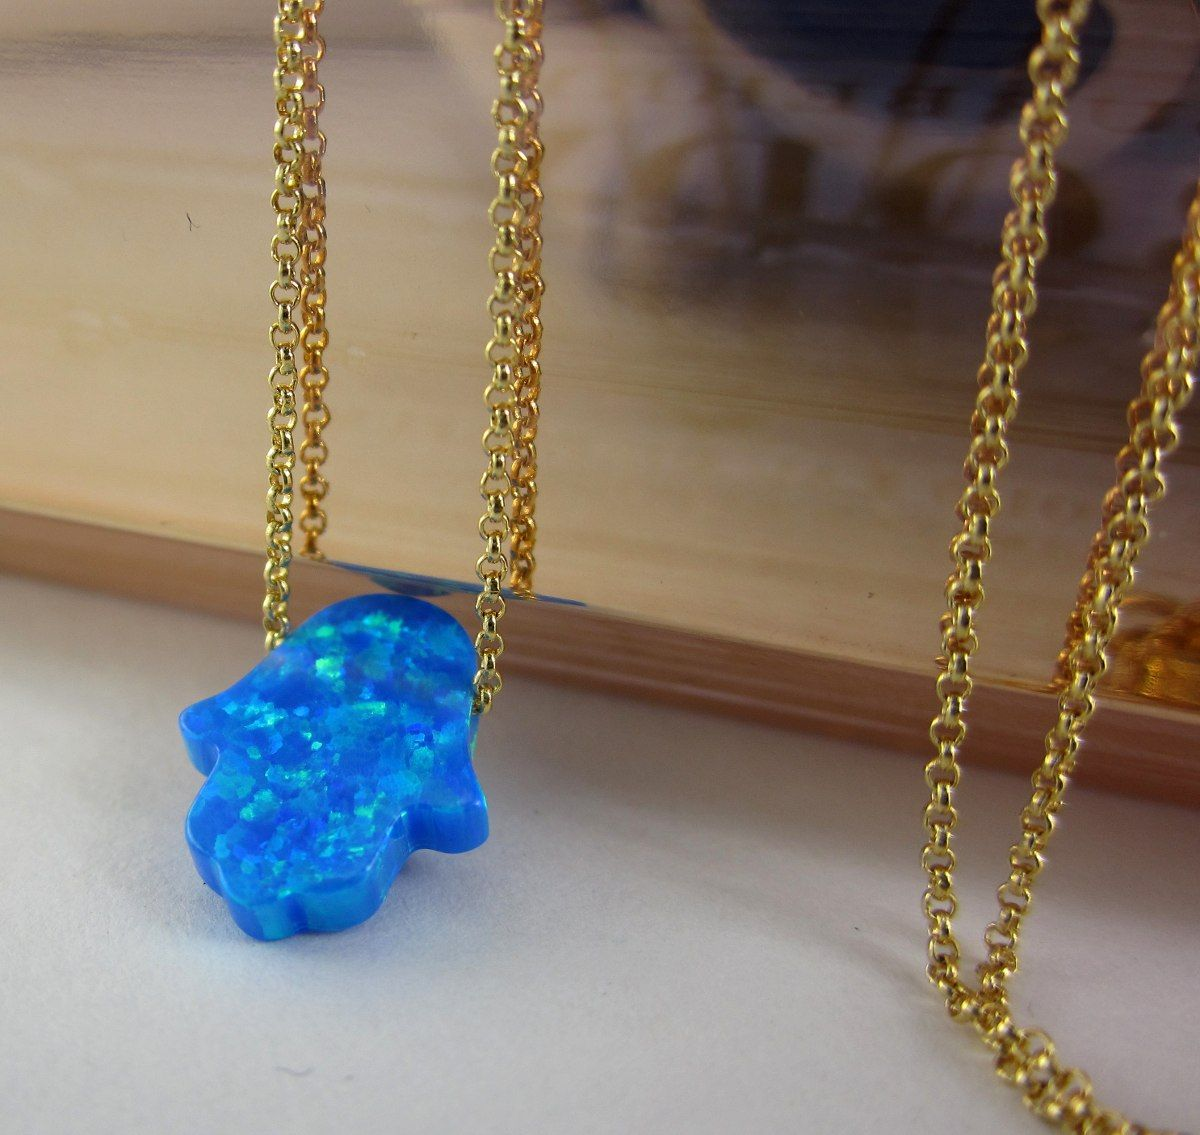 9f0bd79aff65 Collar mujer mano hamsa opalo cadena oro golfi lindas joyas Accesorios para  mujer